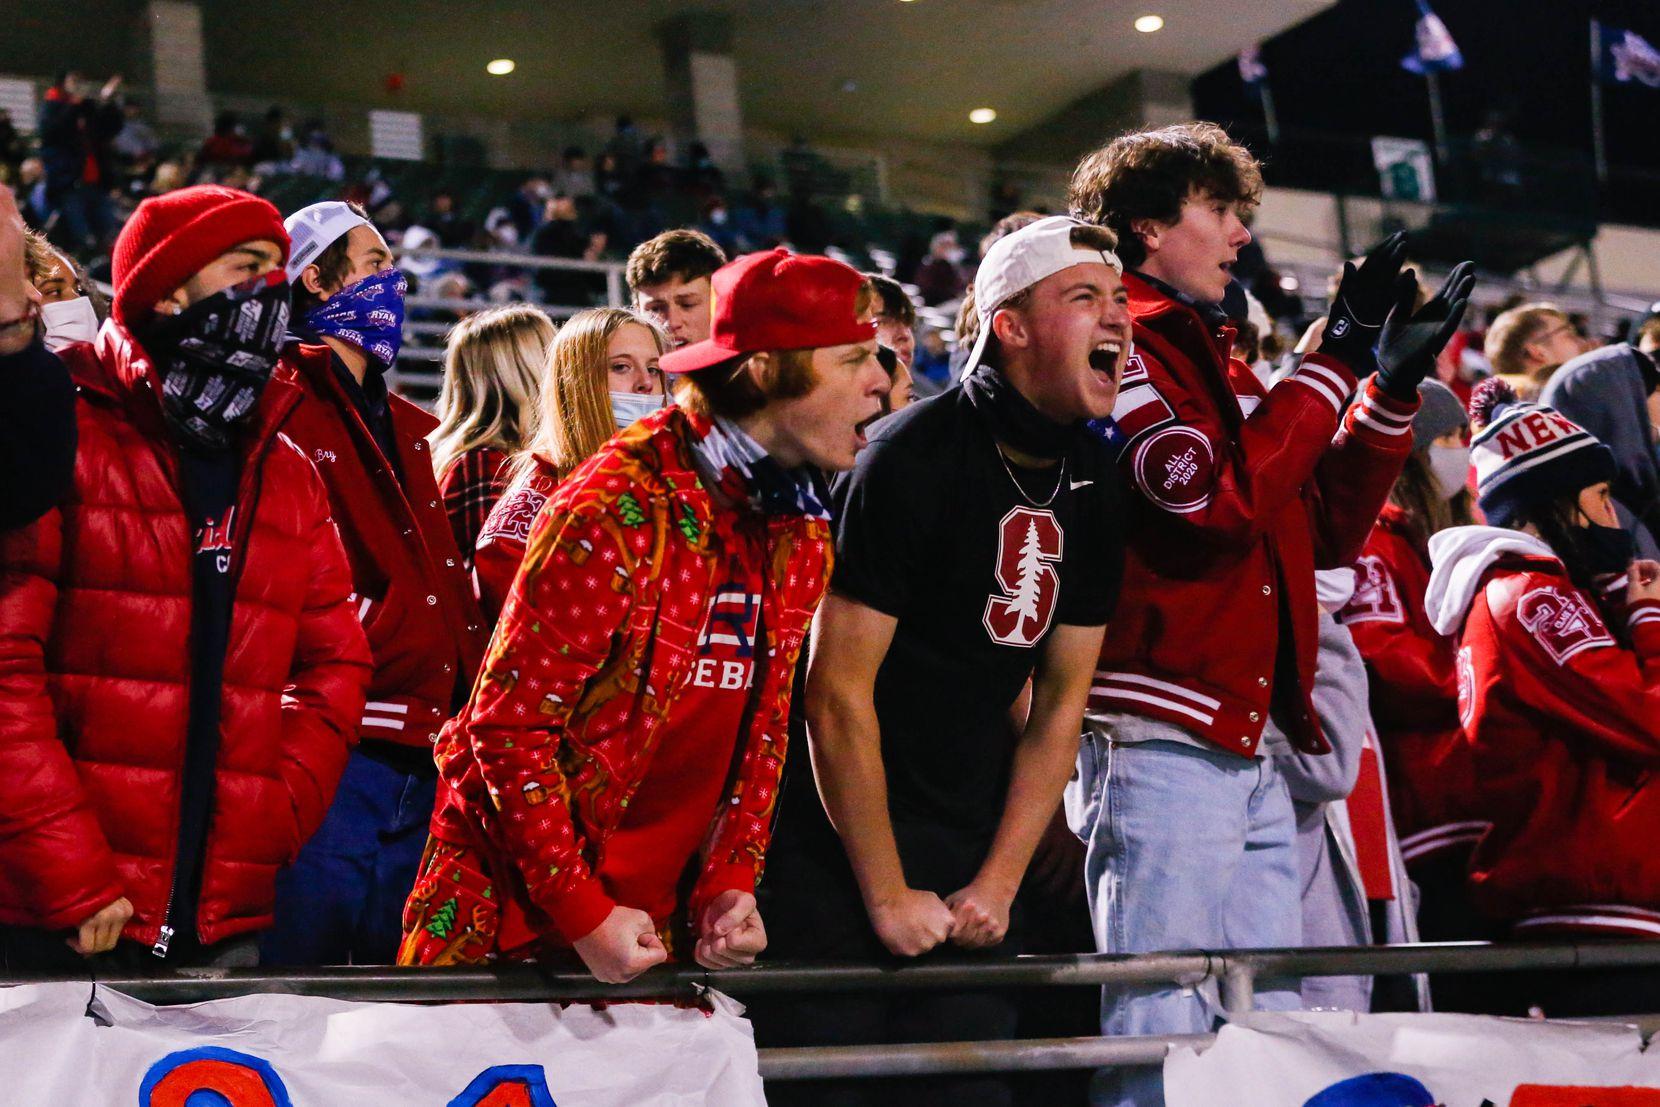 Denton Ryan football fans celebrate a play against Frisco Lone Star during the fourth quarter at the C.H. Collins Complex in Denton on Thursday, Dec. 4, 2020. Denton Ryan won, 35-21. (Juan Figueroa/ The Dallas Morning News)